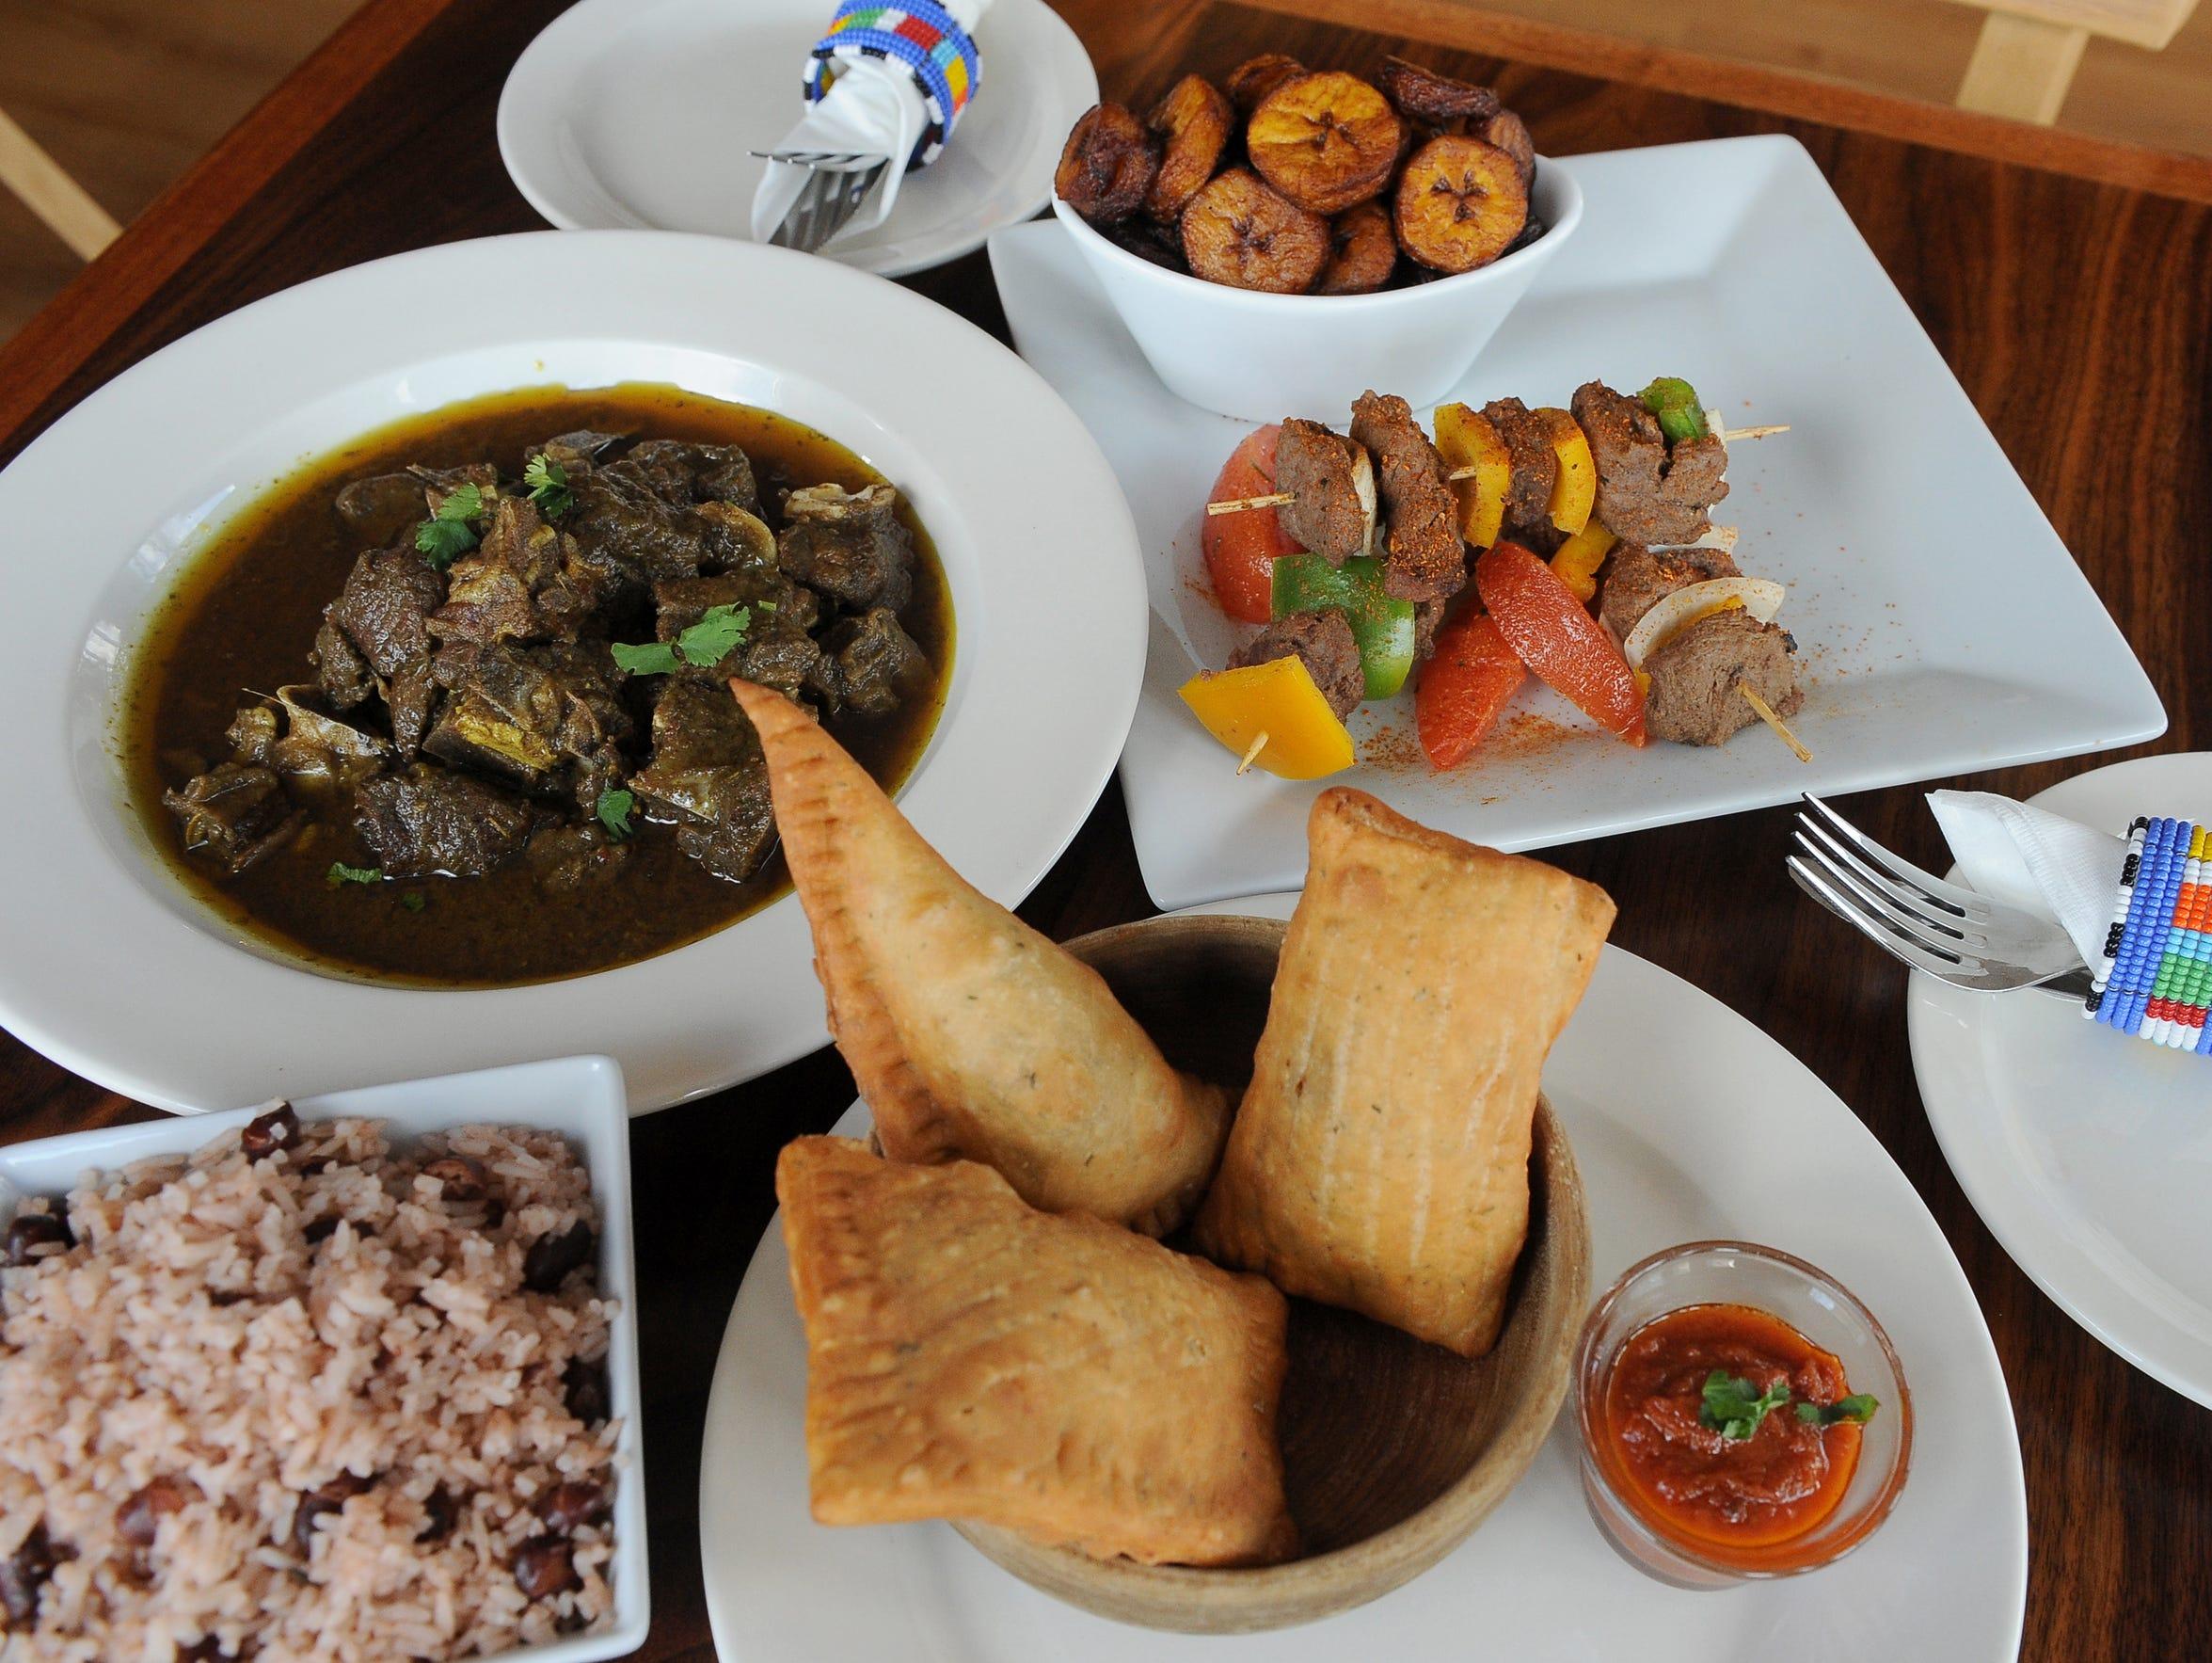 Rice and peas, curry goat, sweet plantain, chichinga